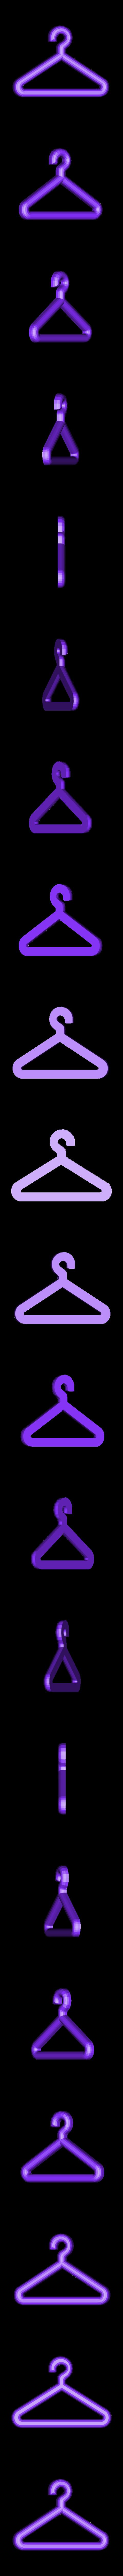 mini ceintre.stl Download STL file mini hanger • 3D print template, YOHAN_3D